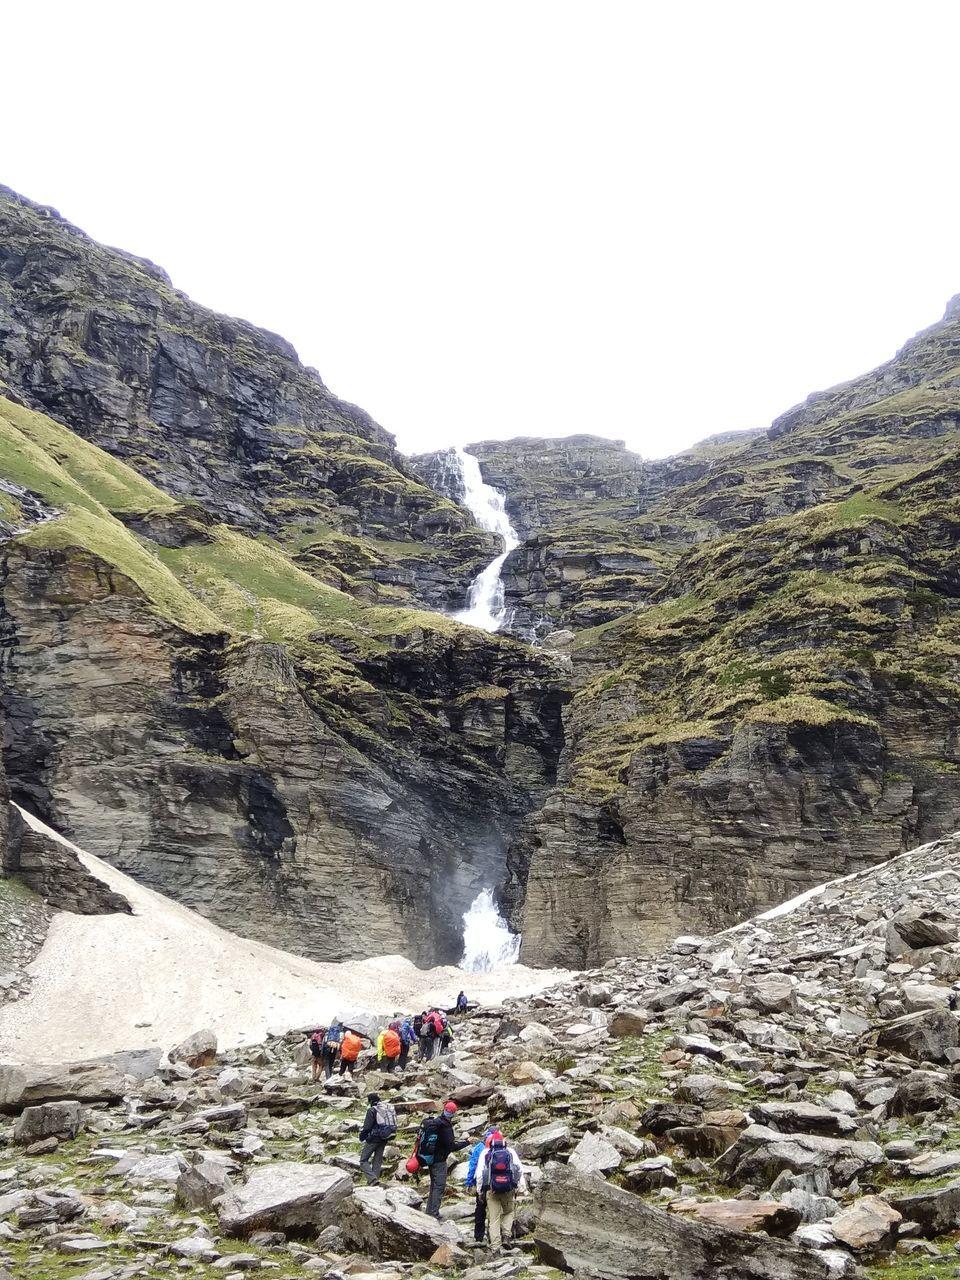 Photos of Rupin Pass Trek: An Awesome Cordillera to Trek 1/1 by Anil Kumar